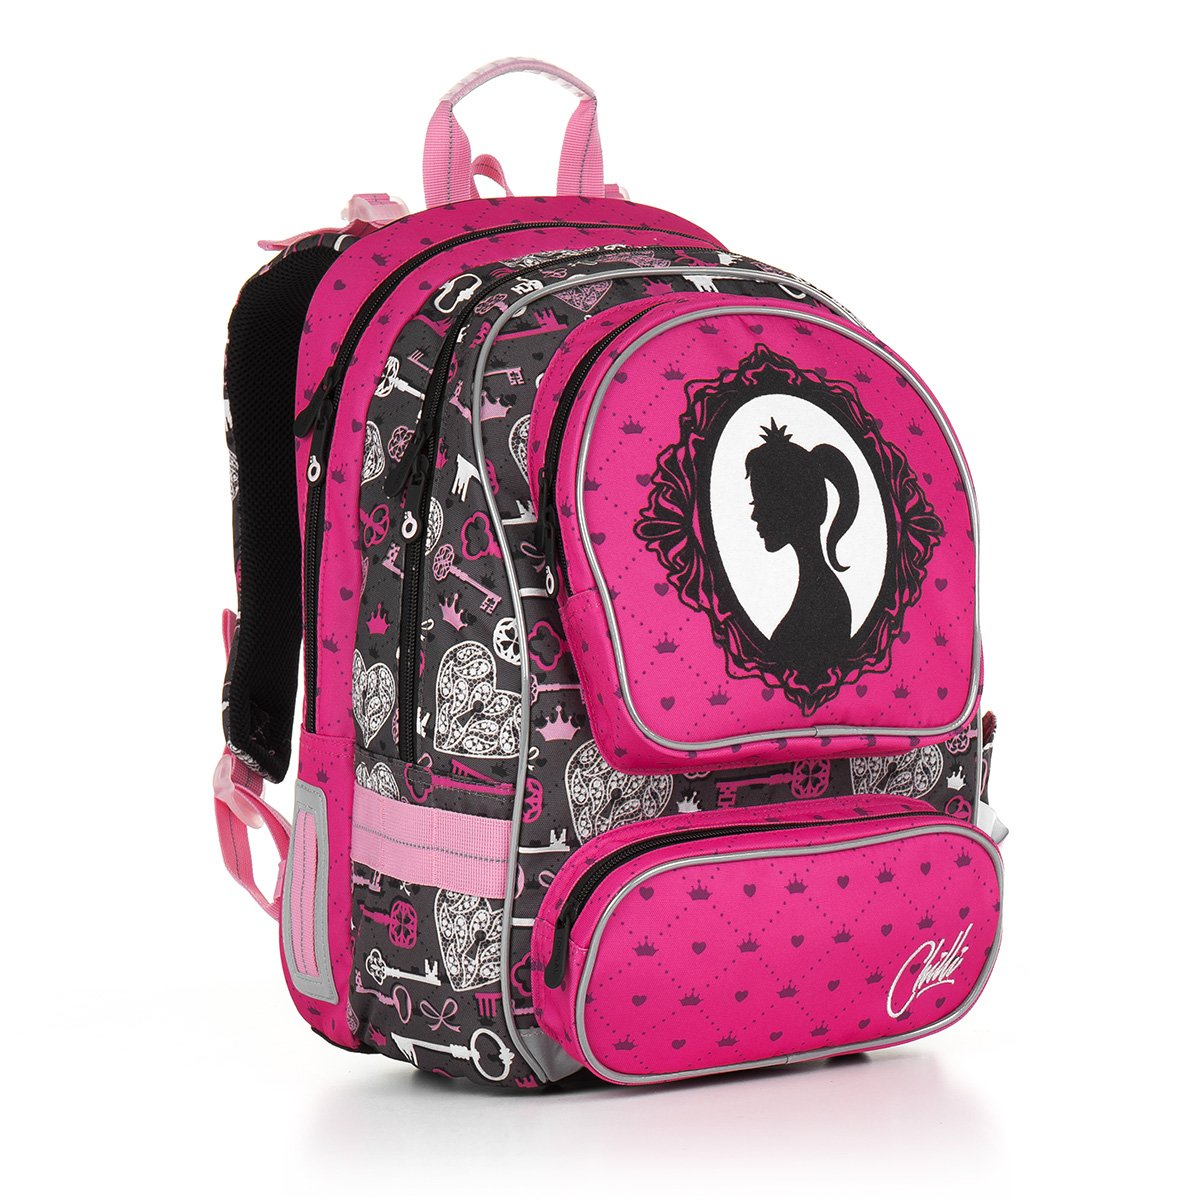 Iskolatáska Topgal CHI 875 H - Pink